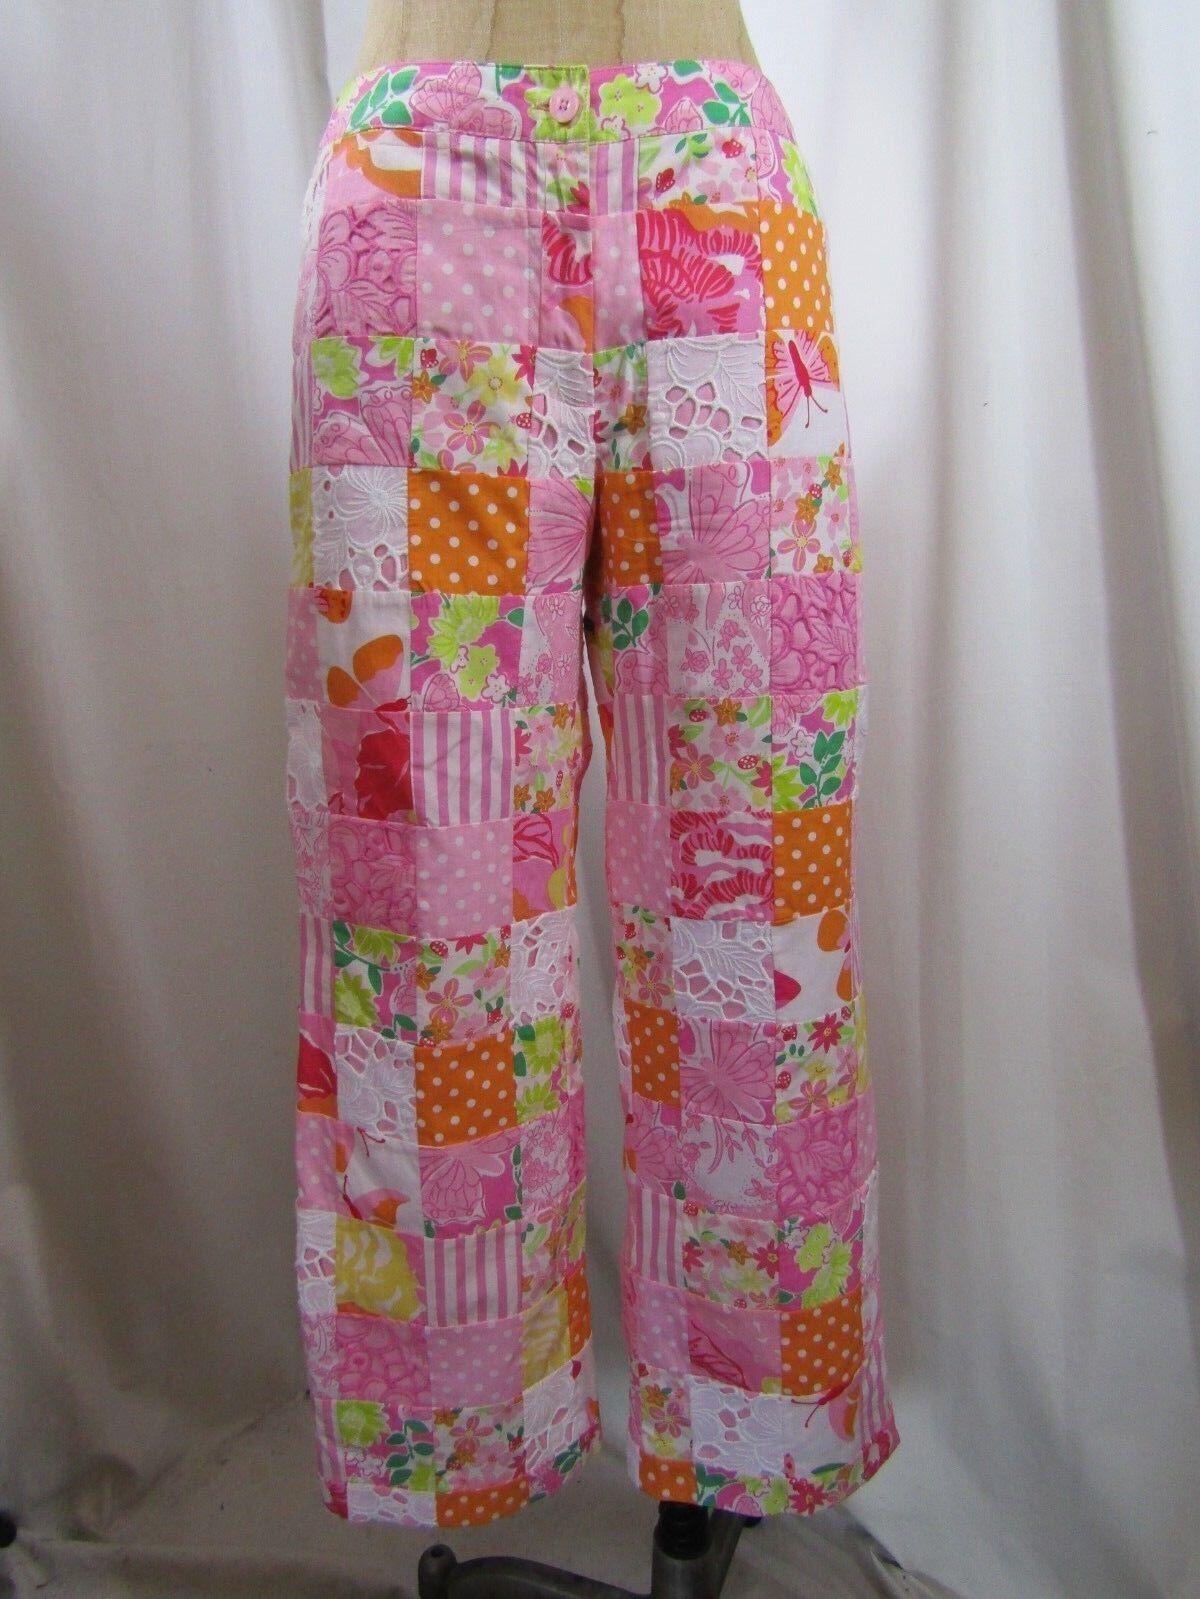 Vintage Lilly Pulitzer White Label Sewn Patchwork Capri Pants Size 2